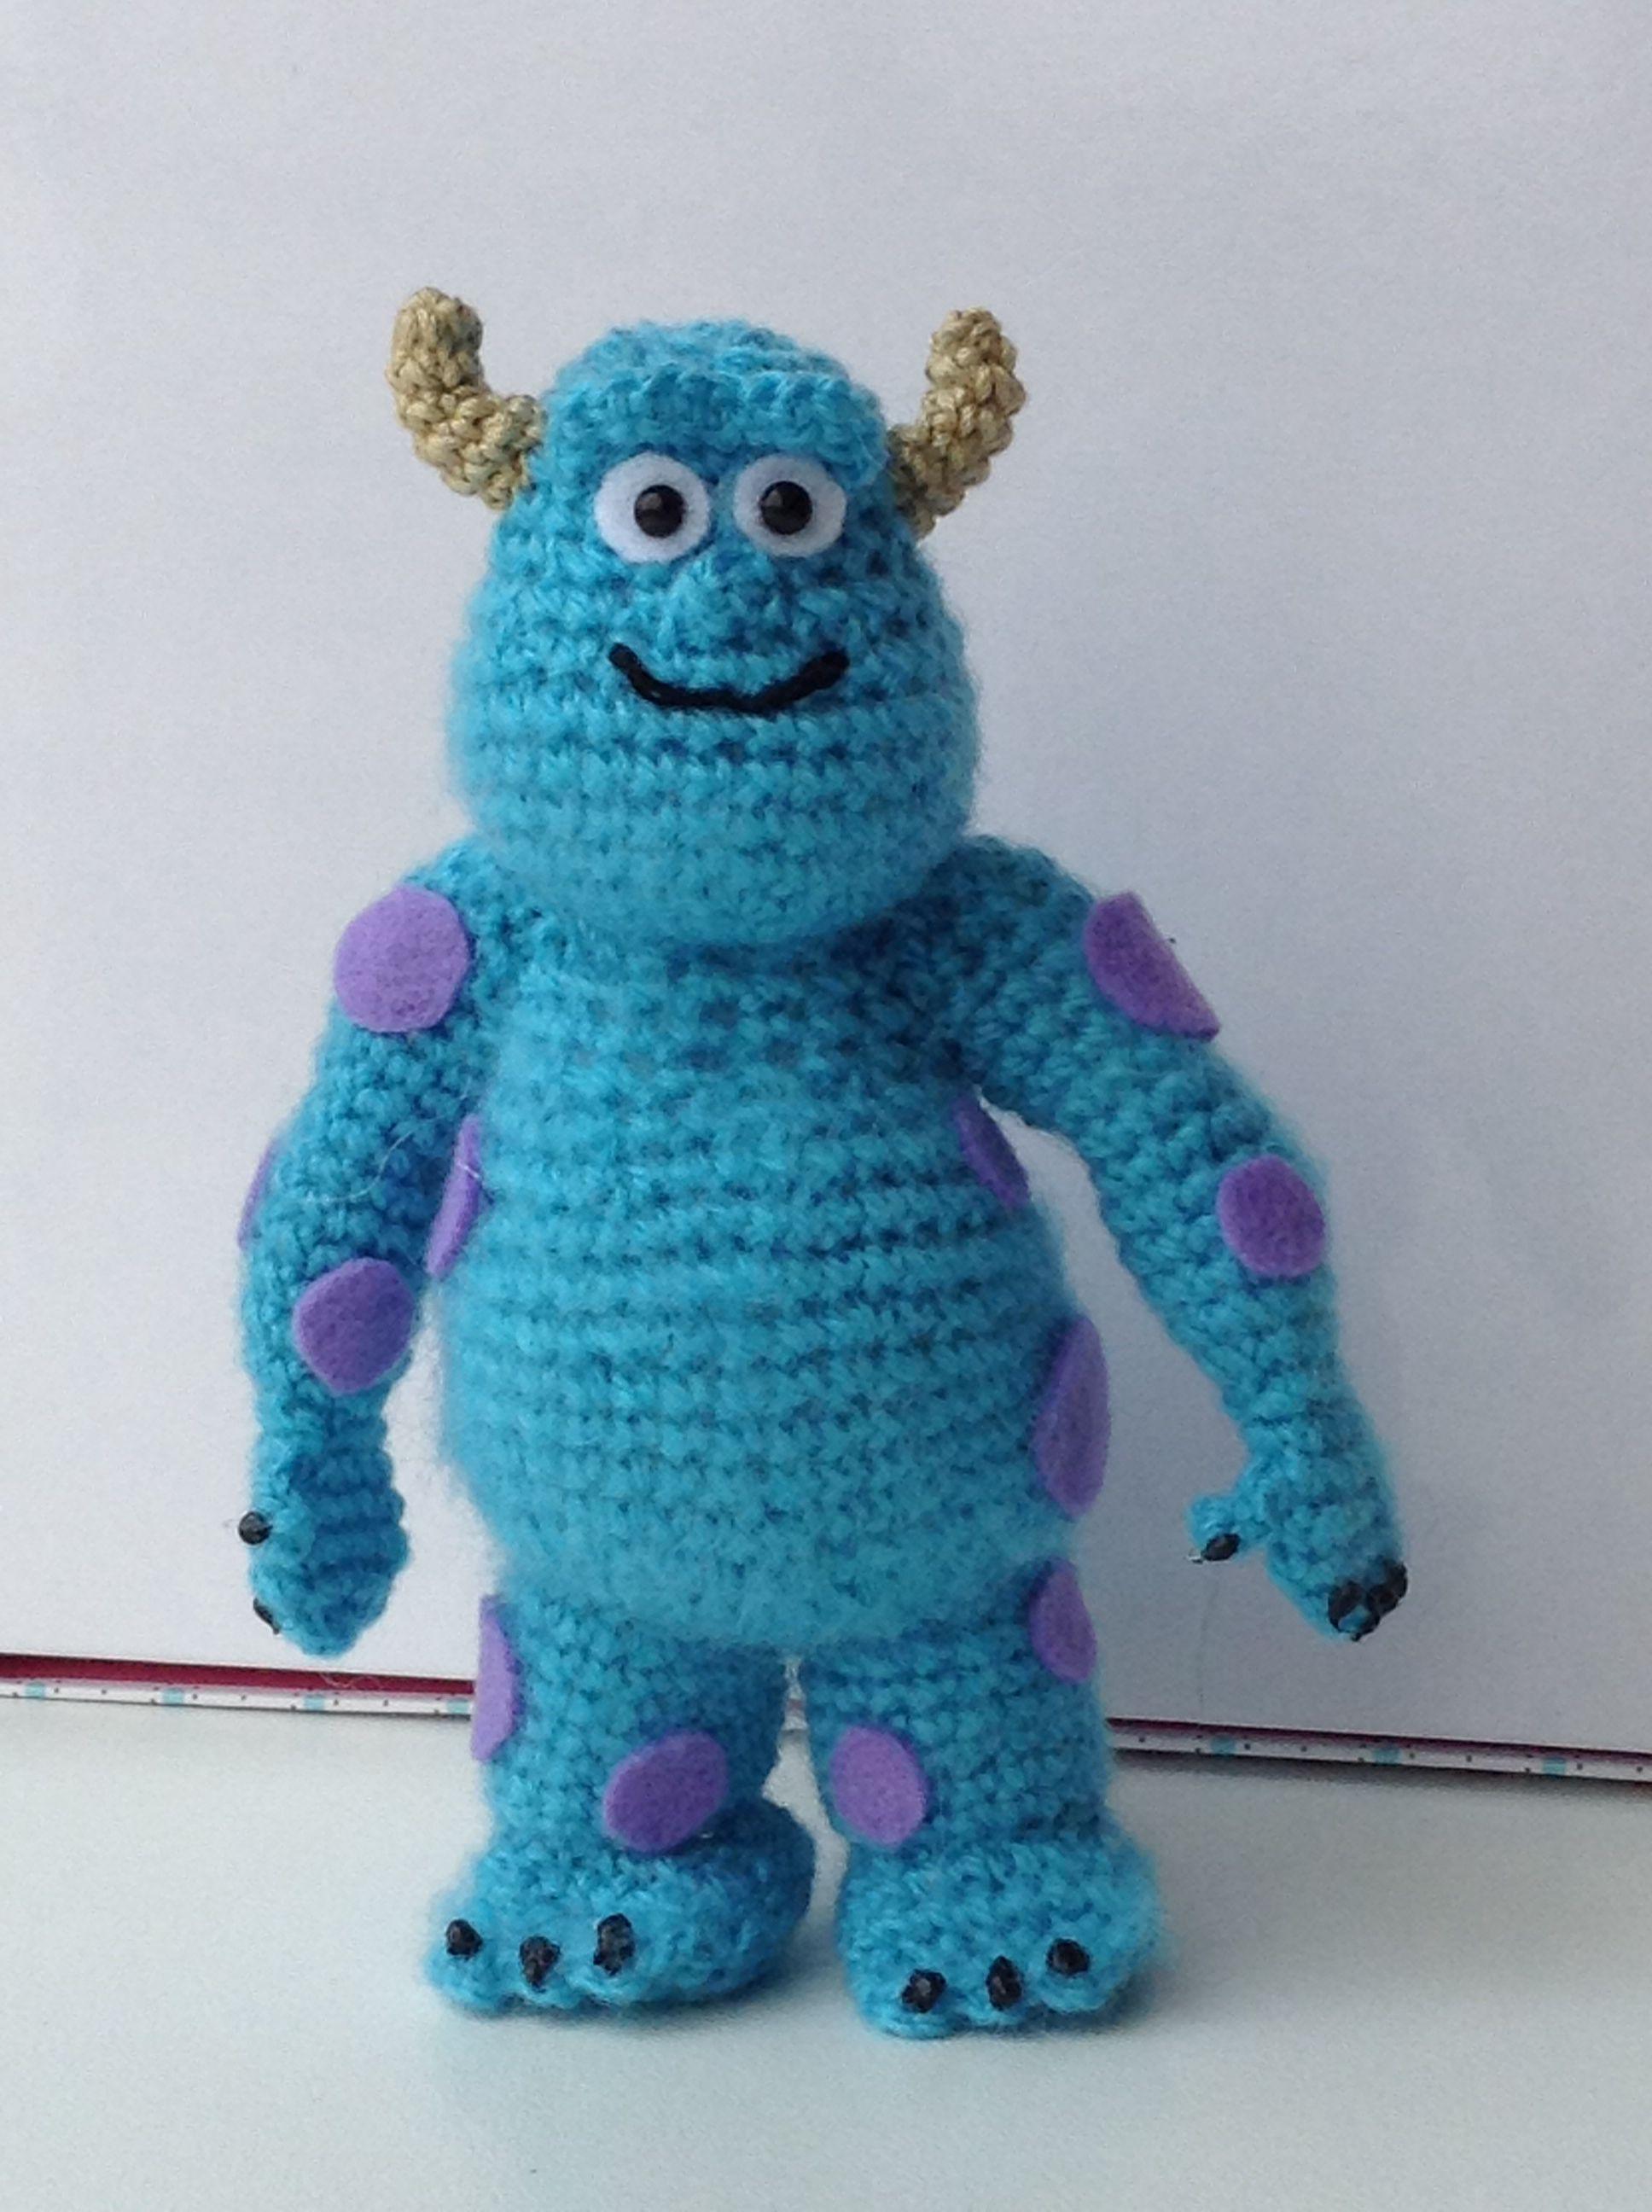 Amigurumi Baby Monsters : Sully crochet amigurumi #monsters Inc Crochet/knit ...